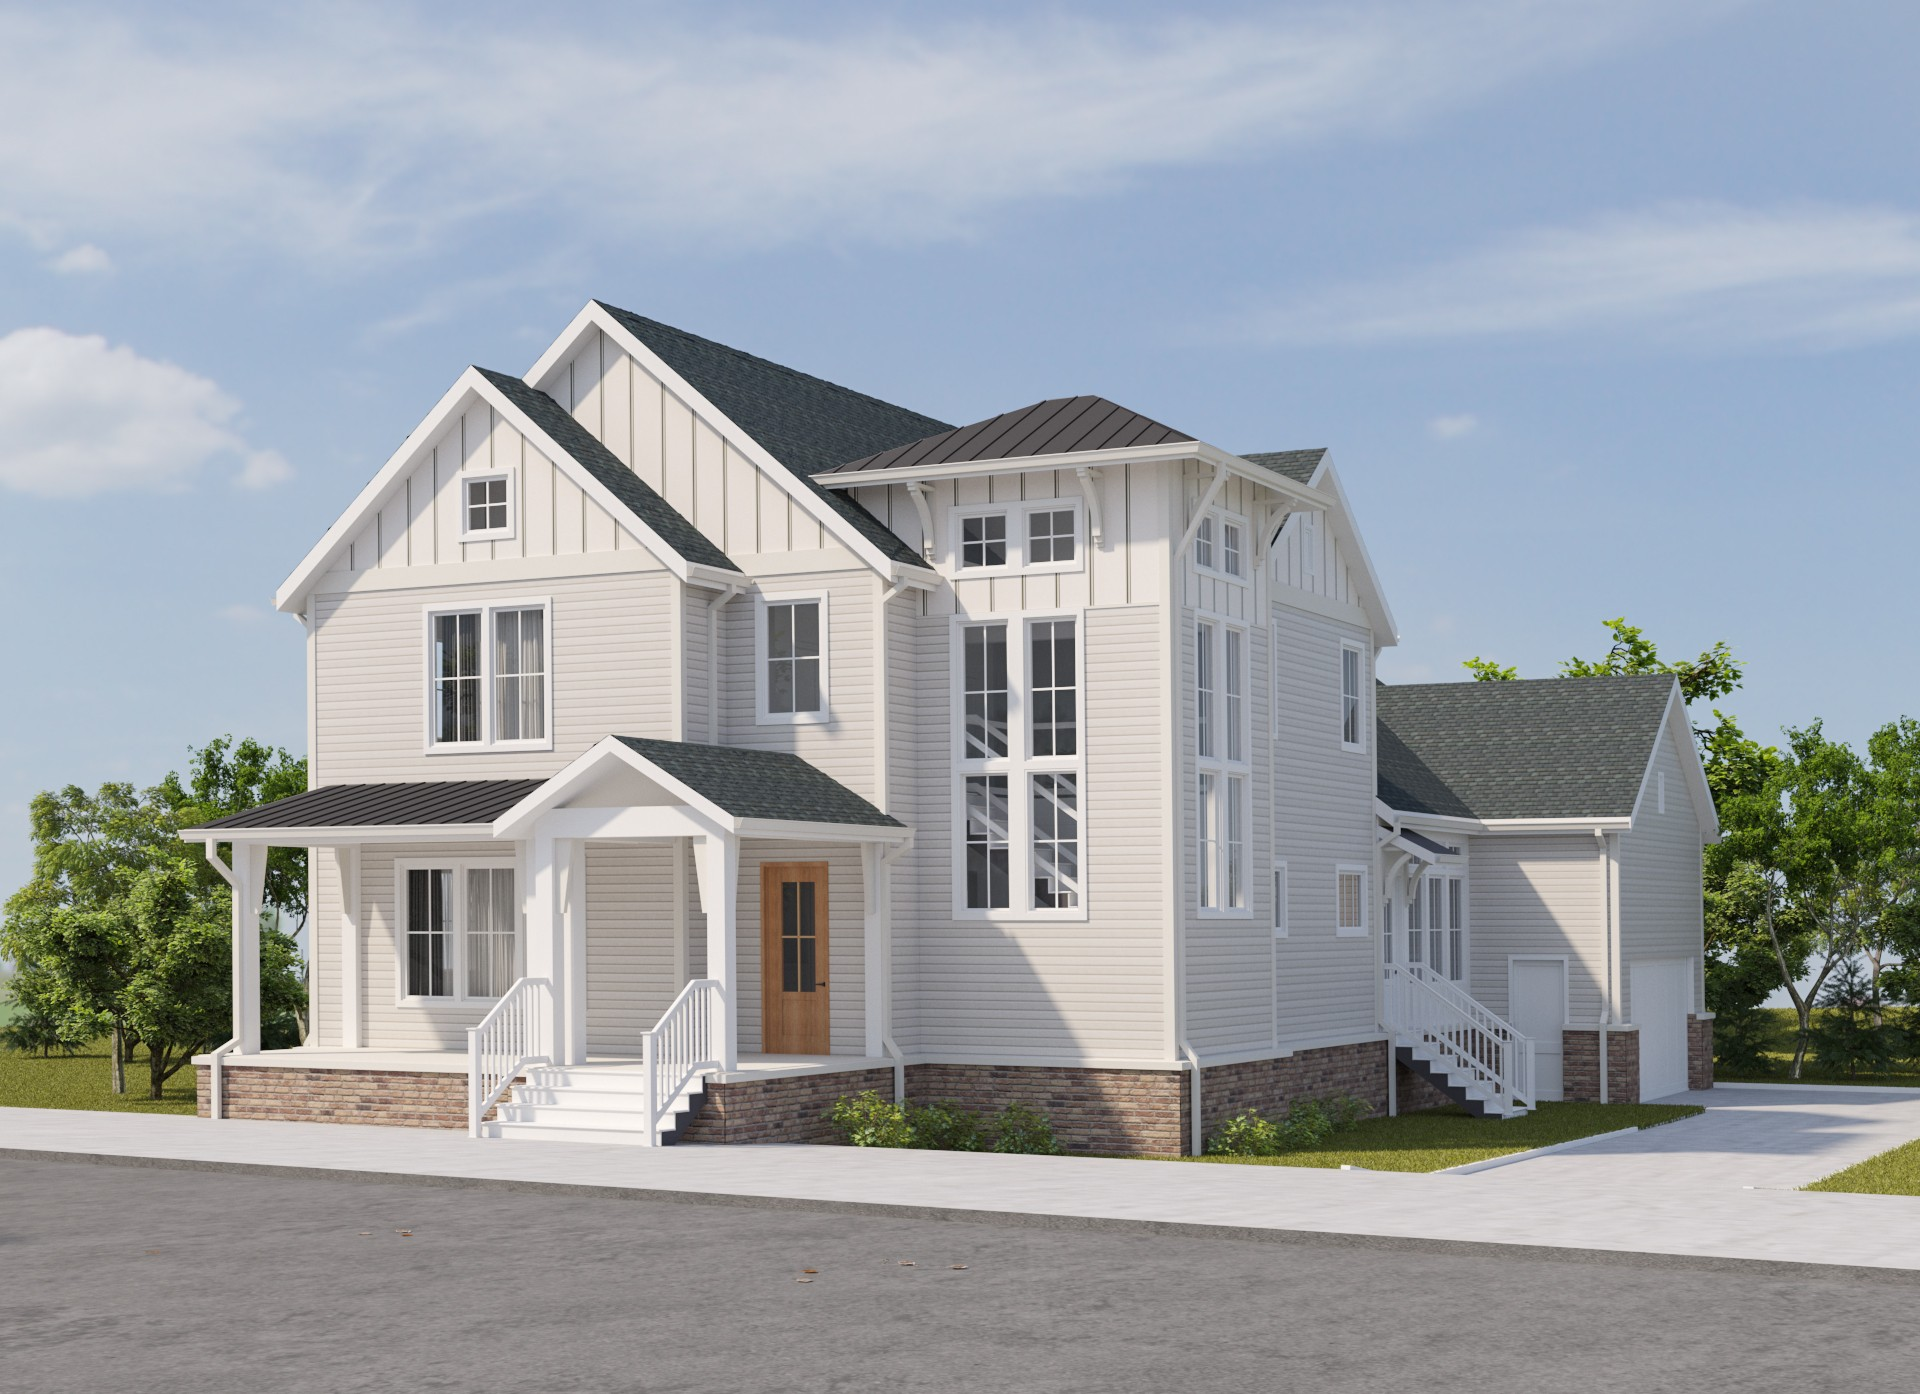 342 Azalea Cir, Hendersonville, TN 37075 - Hendersonville, TN real estate listing